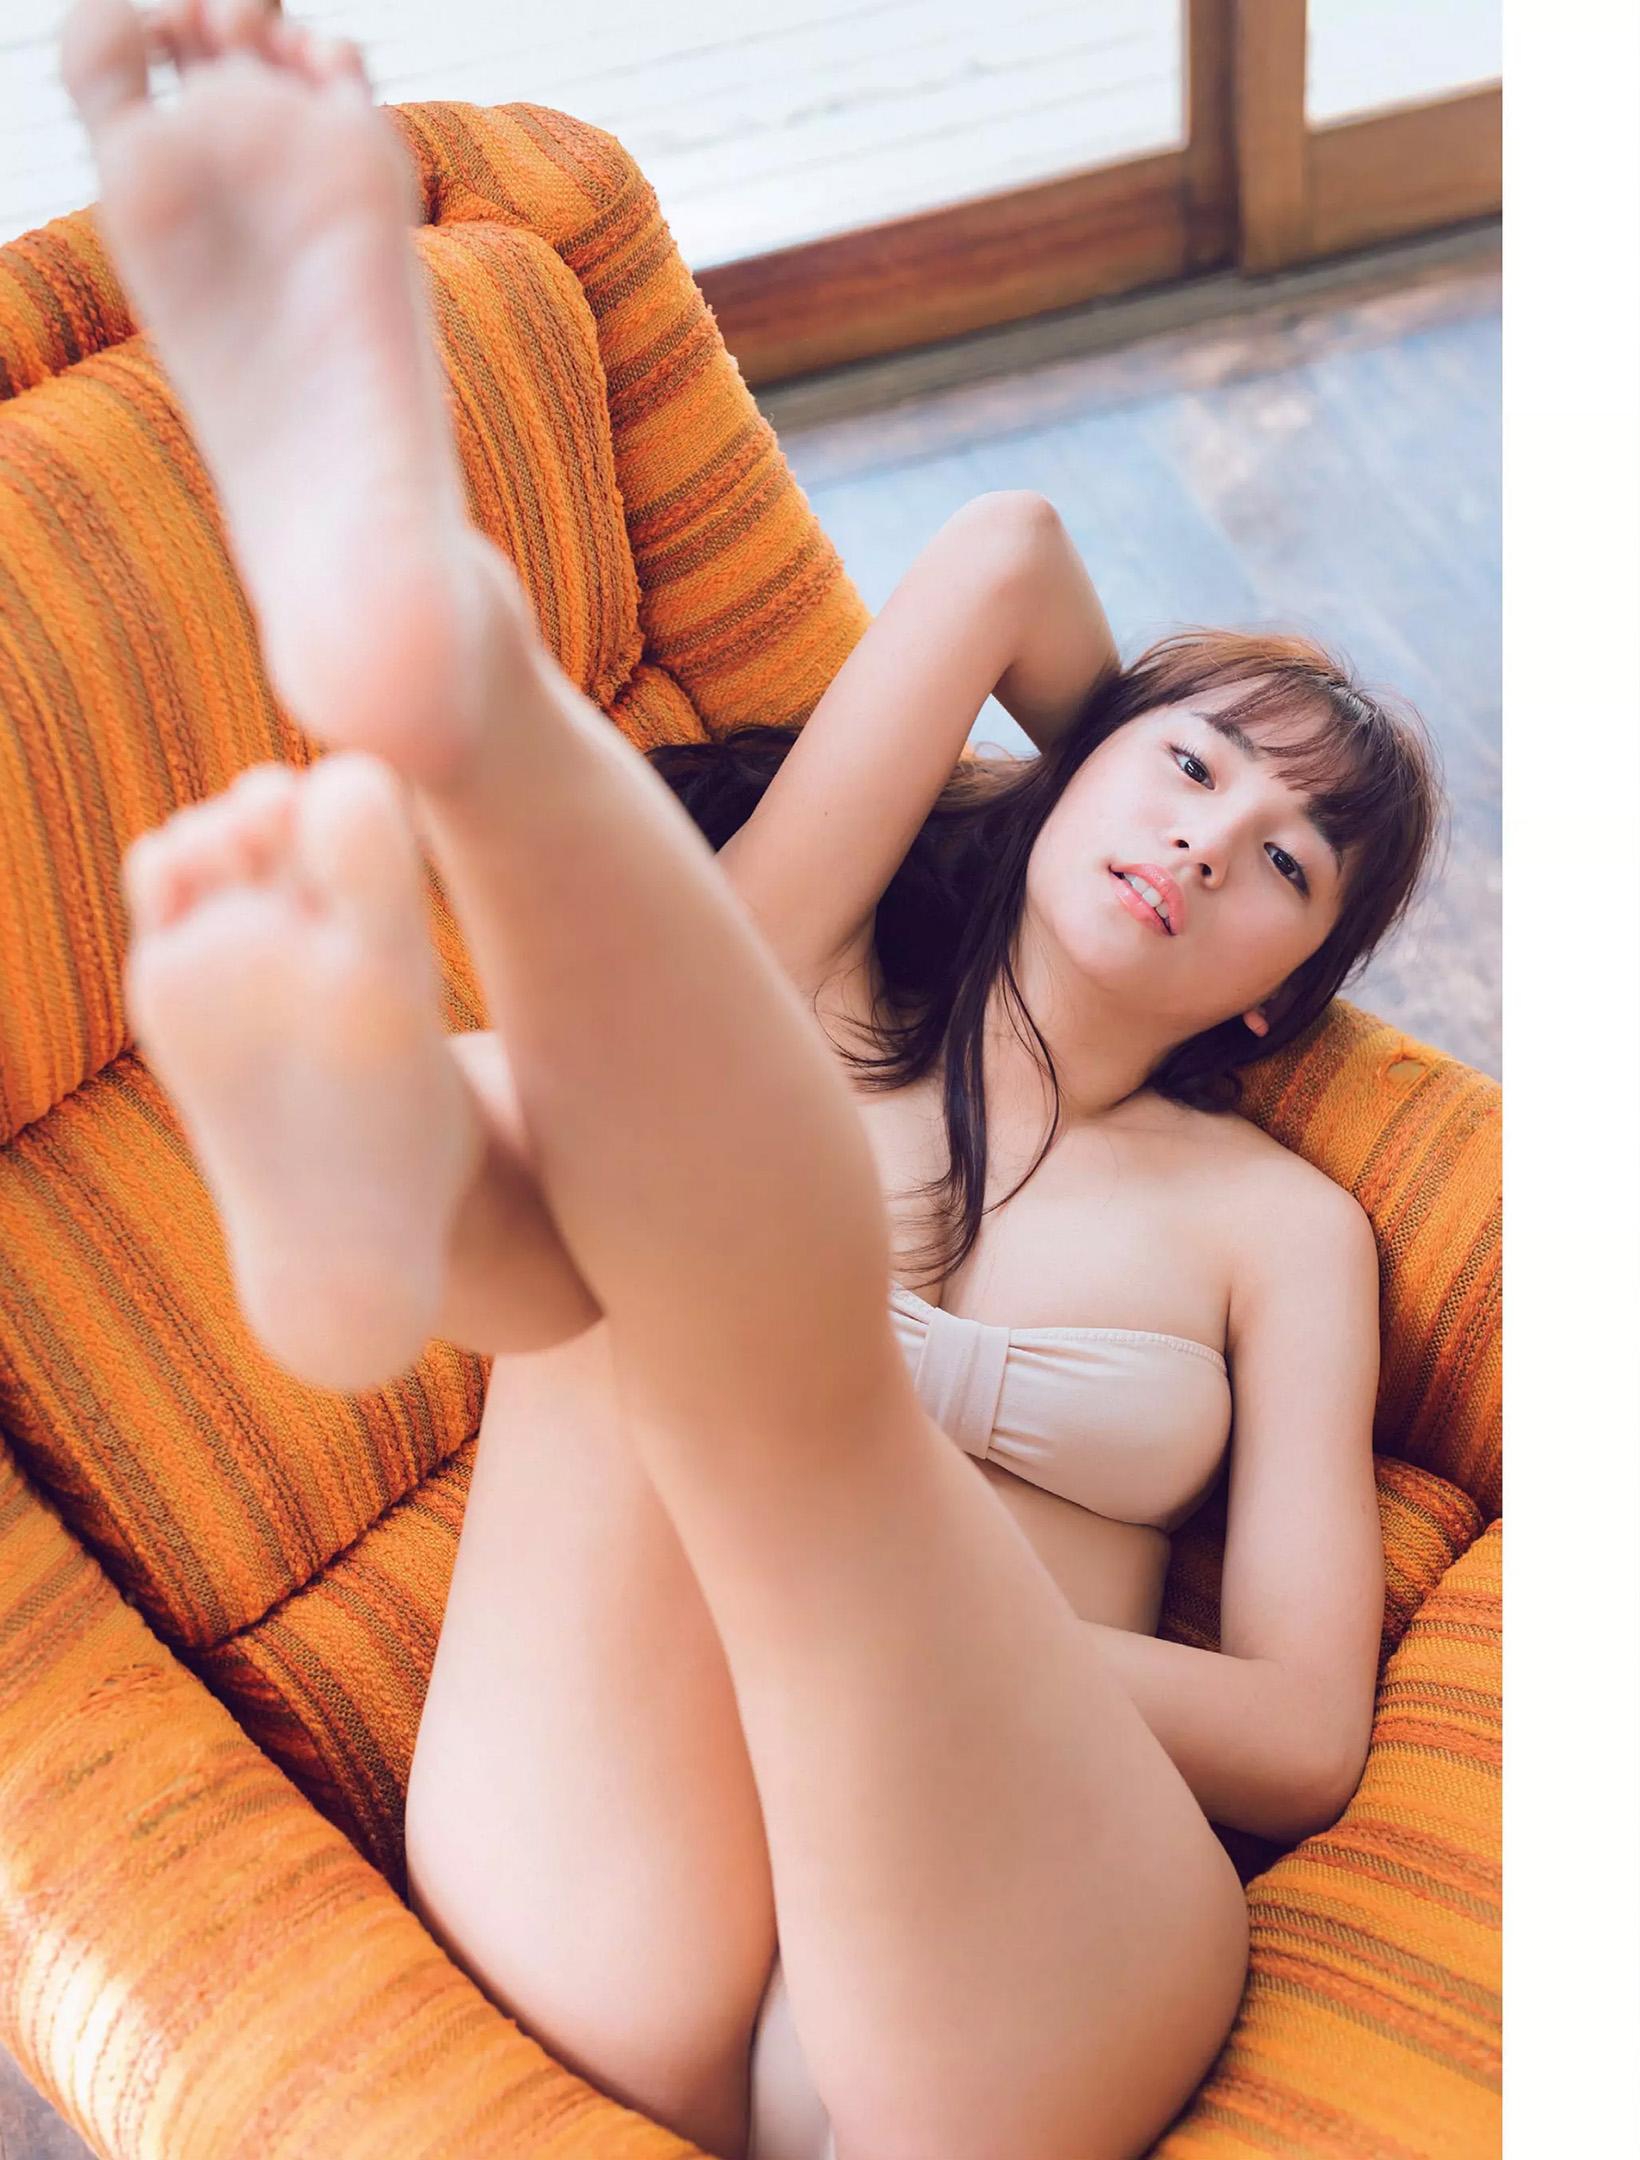 image http://scanlover.com/assets/images/414-5xexsSQj64exvSU5.jpeg